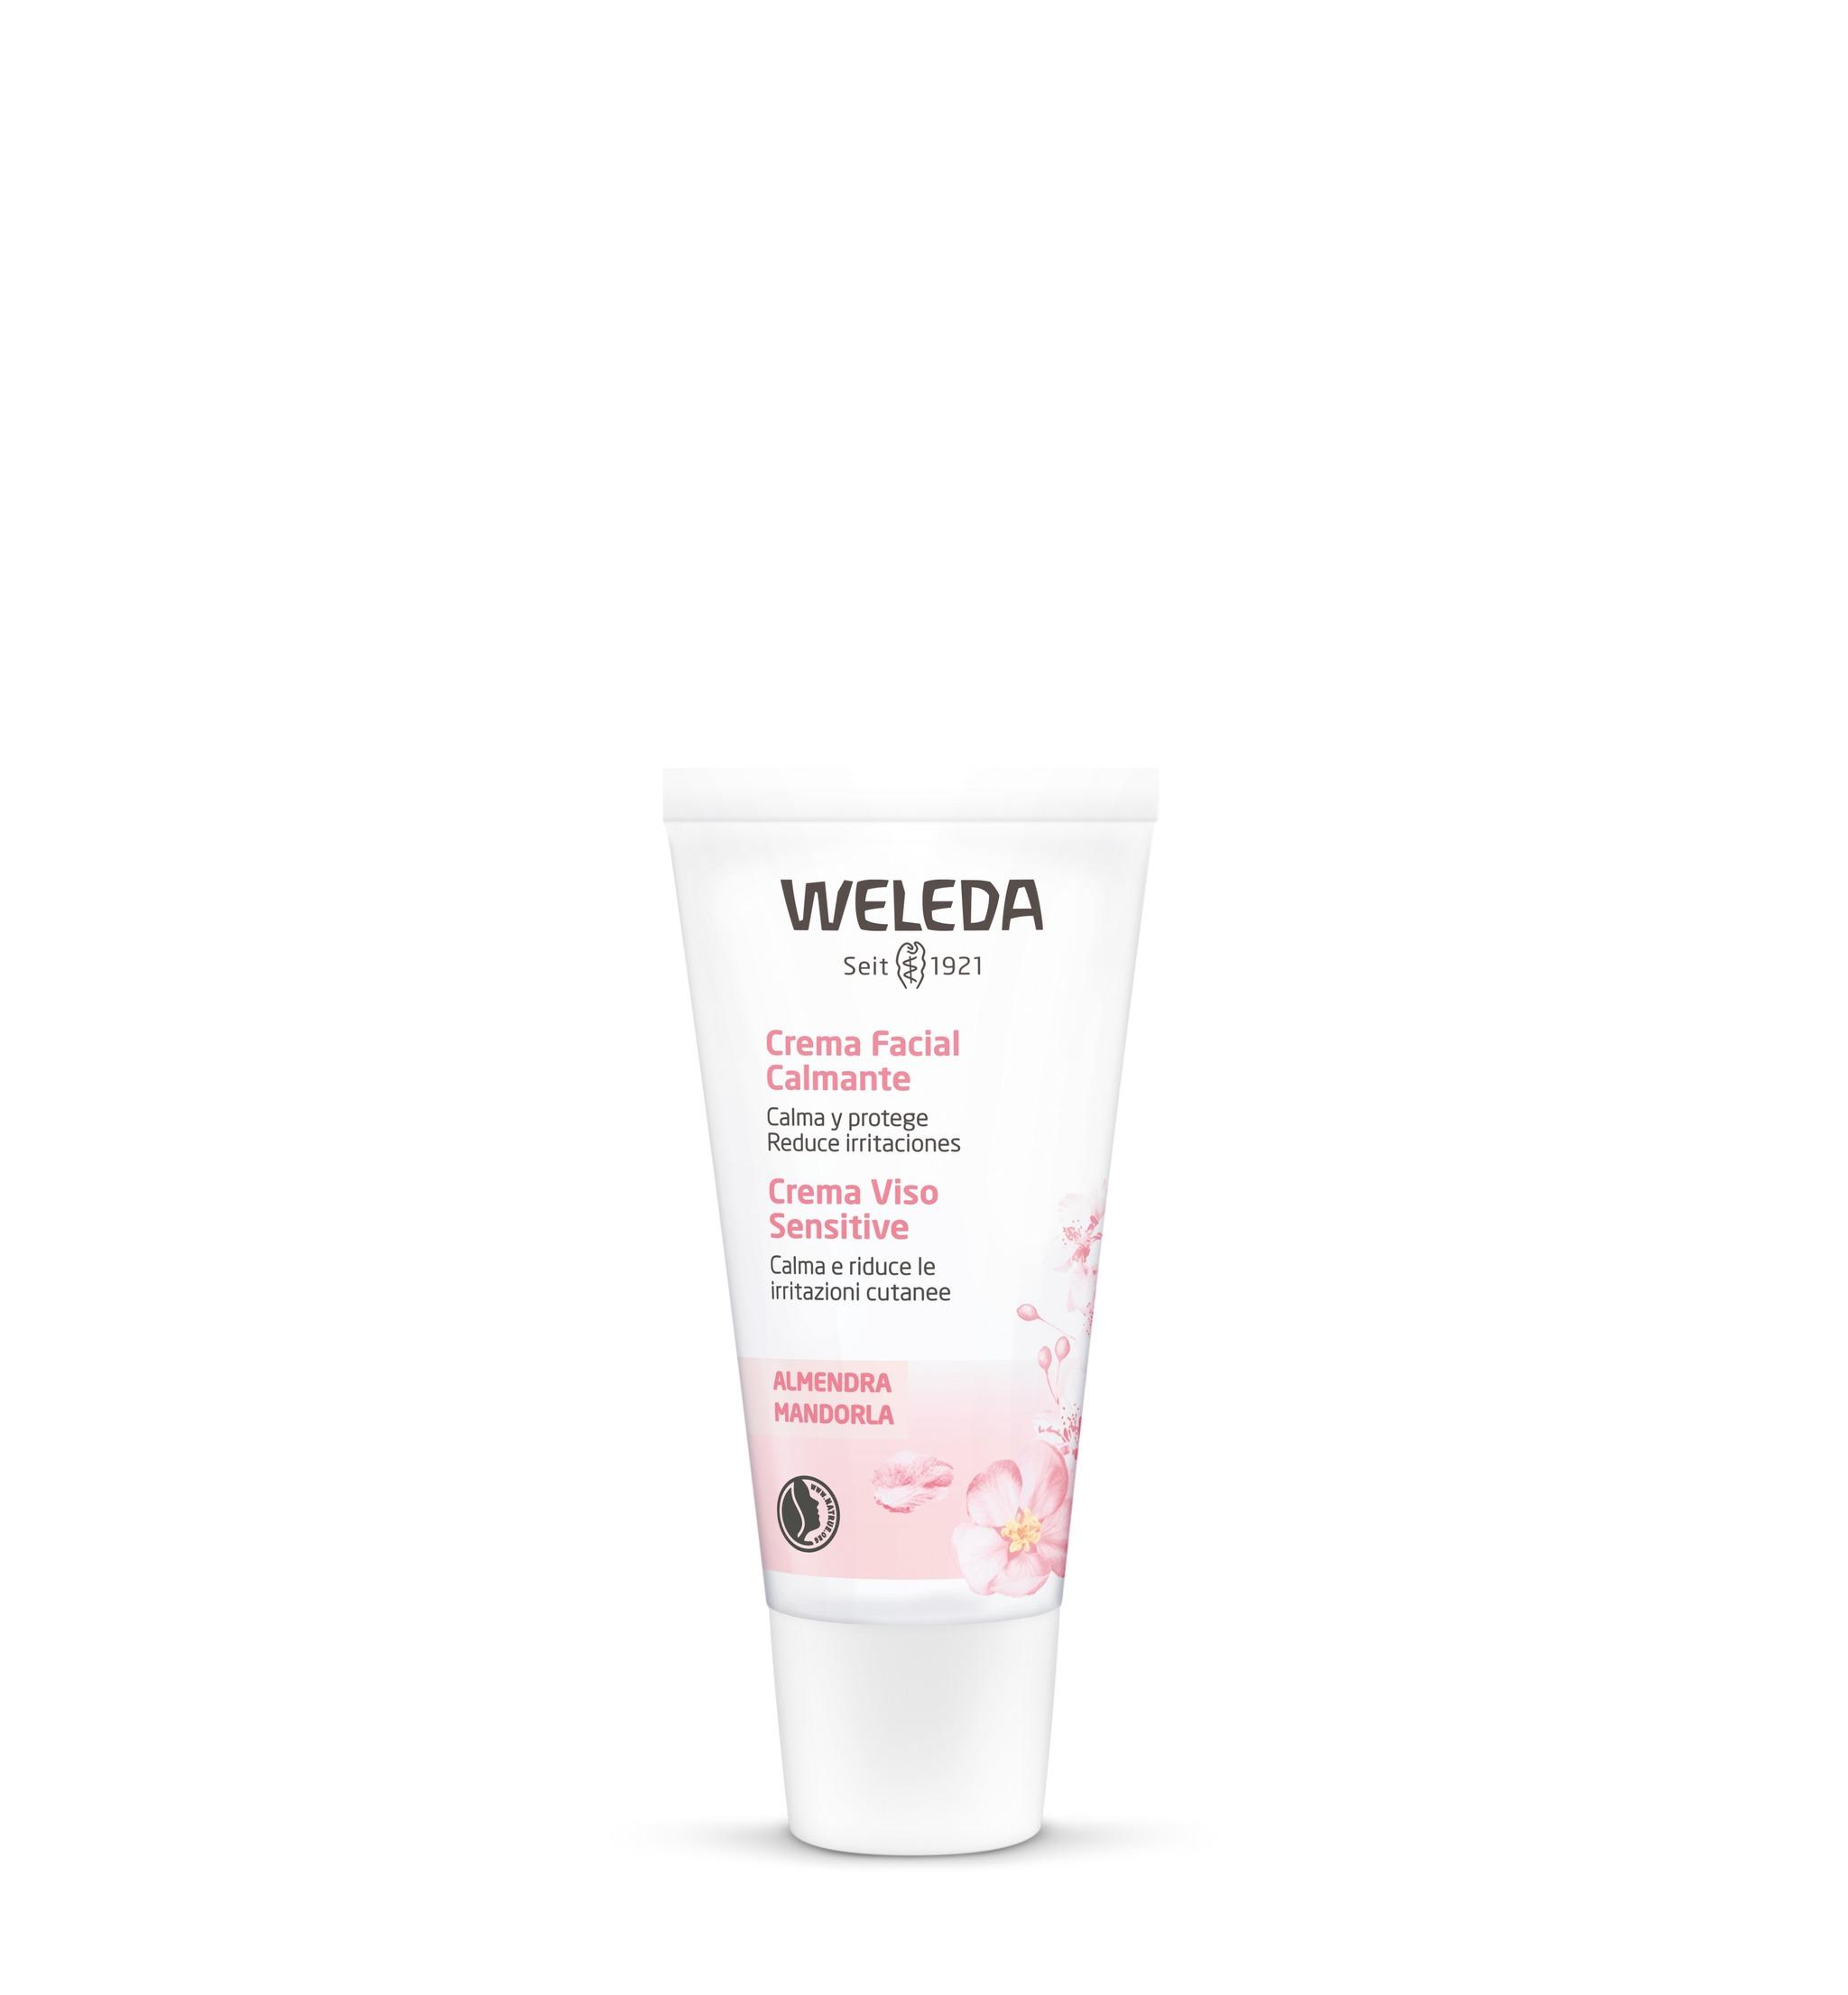 Crema Facial Calmante de Weleda, que fortalece, calma e hidrata la piel. 17,40 euros.